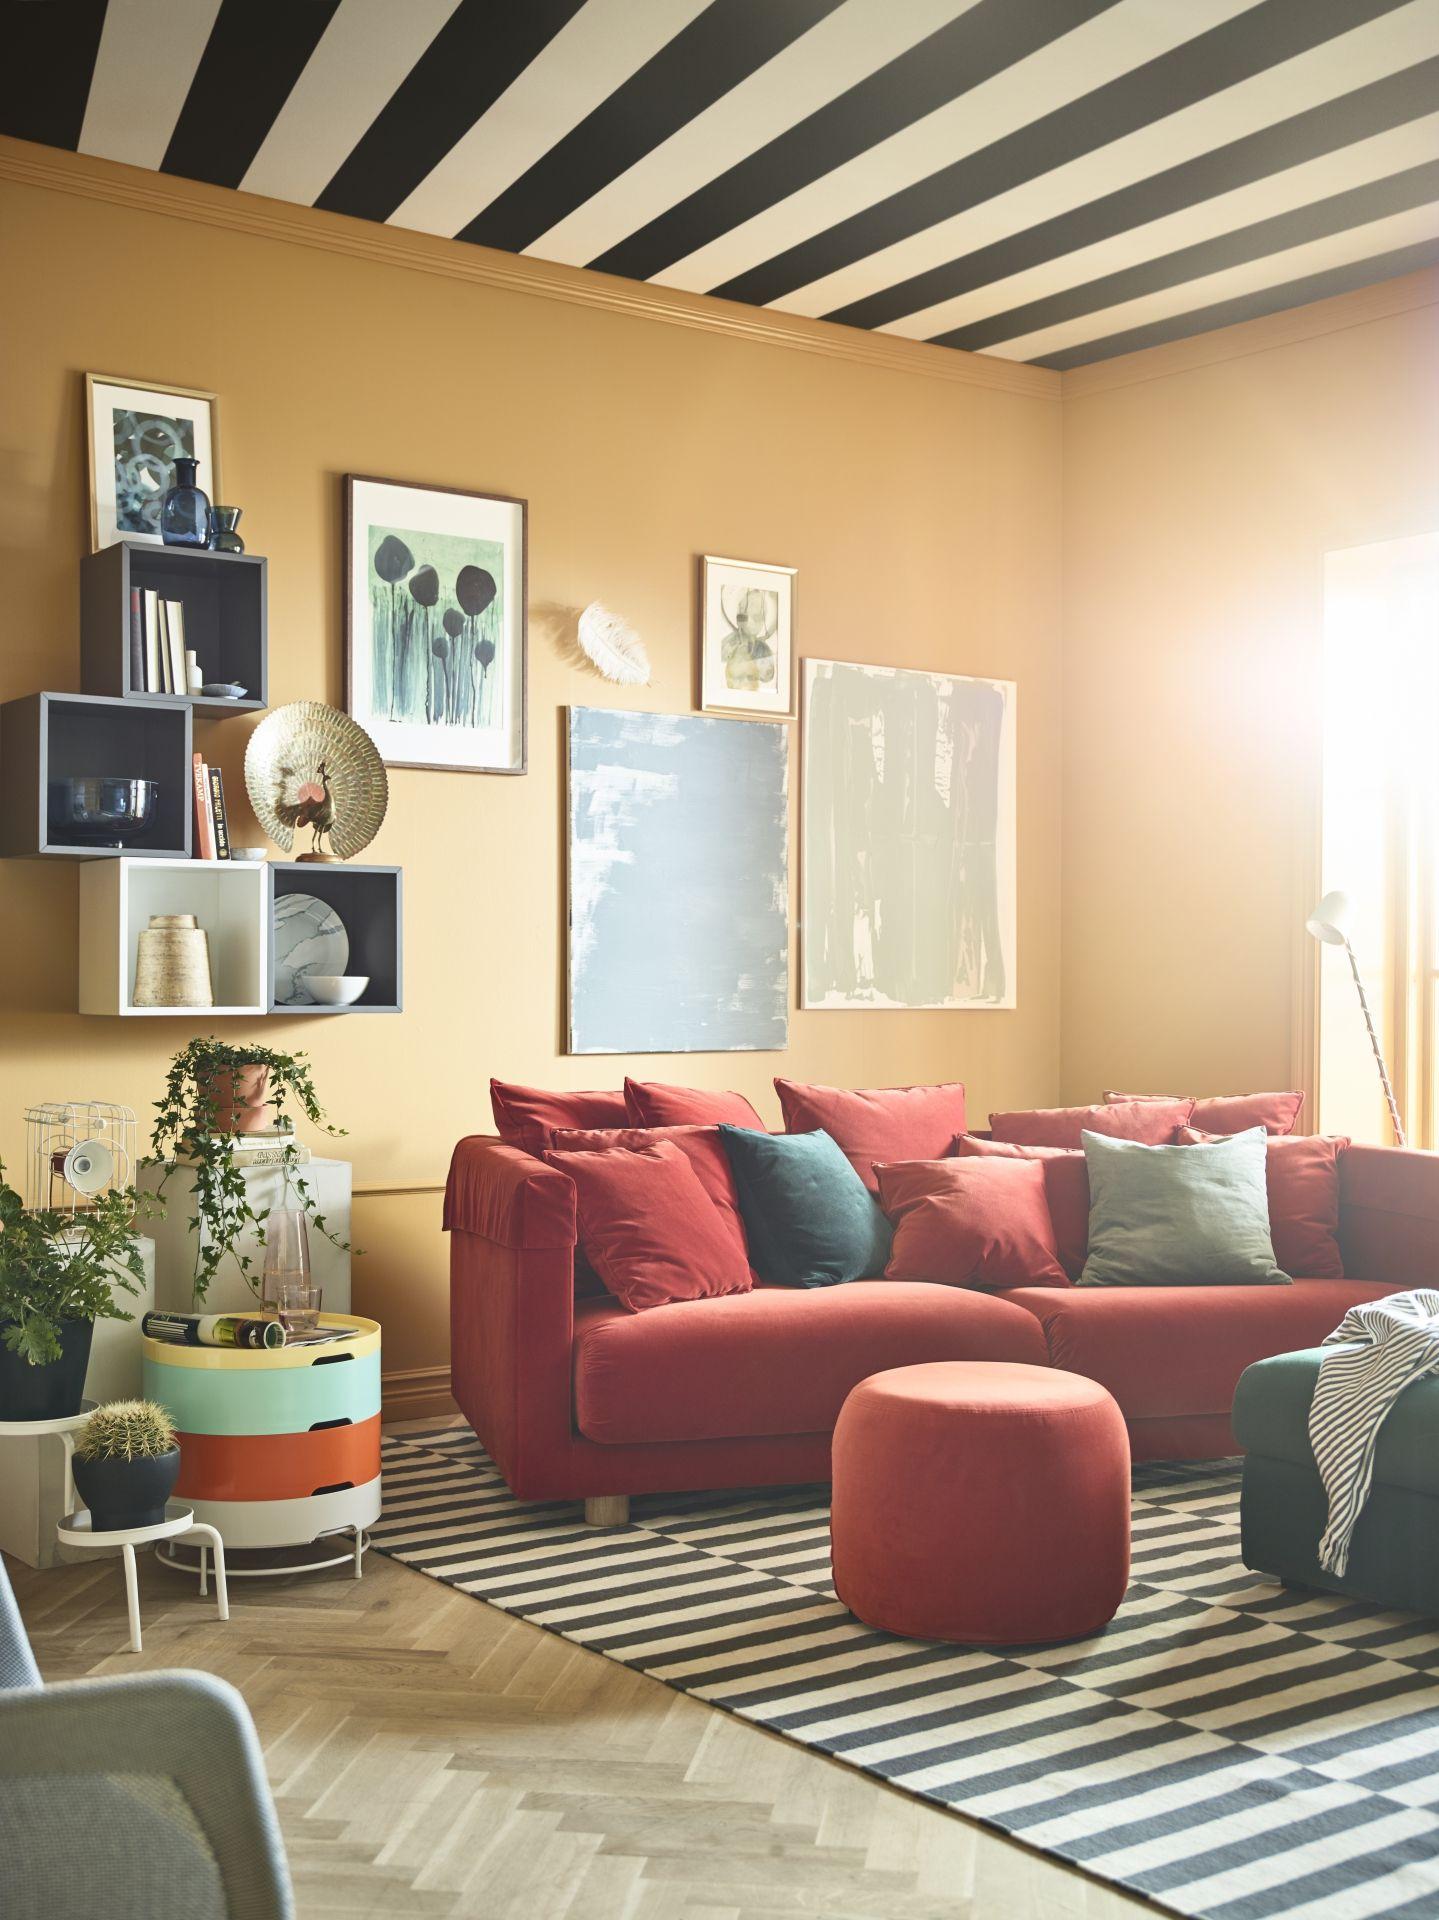 Stockholm 2017 poef ikea ikeanl ikeanederland slaapkamer for Kamer interieur inspiratie